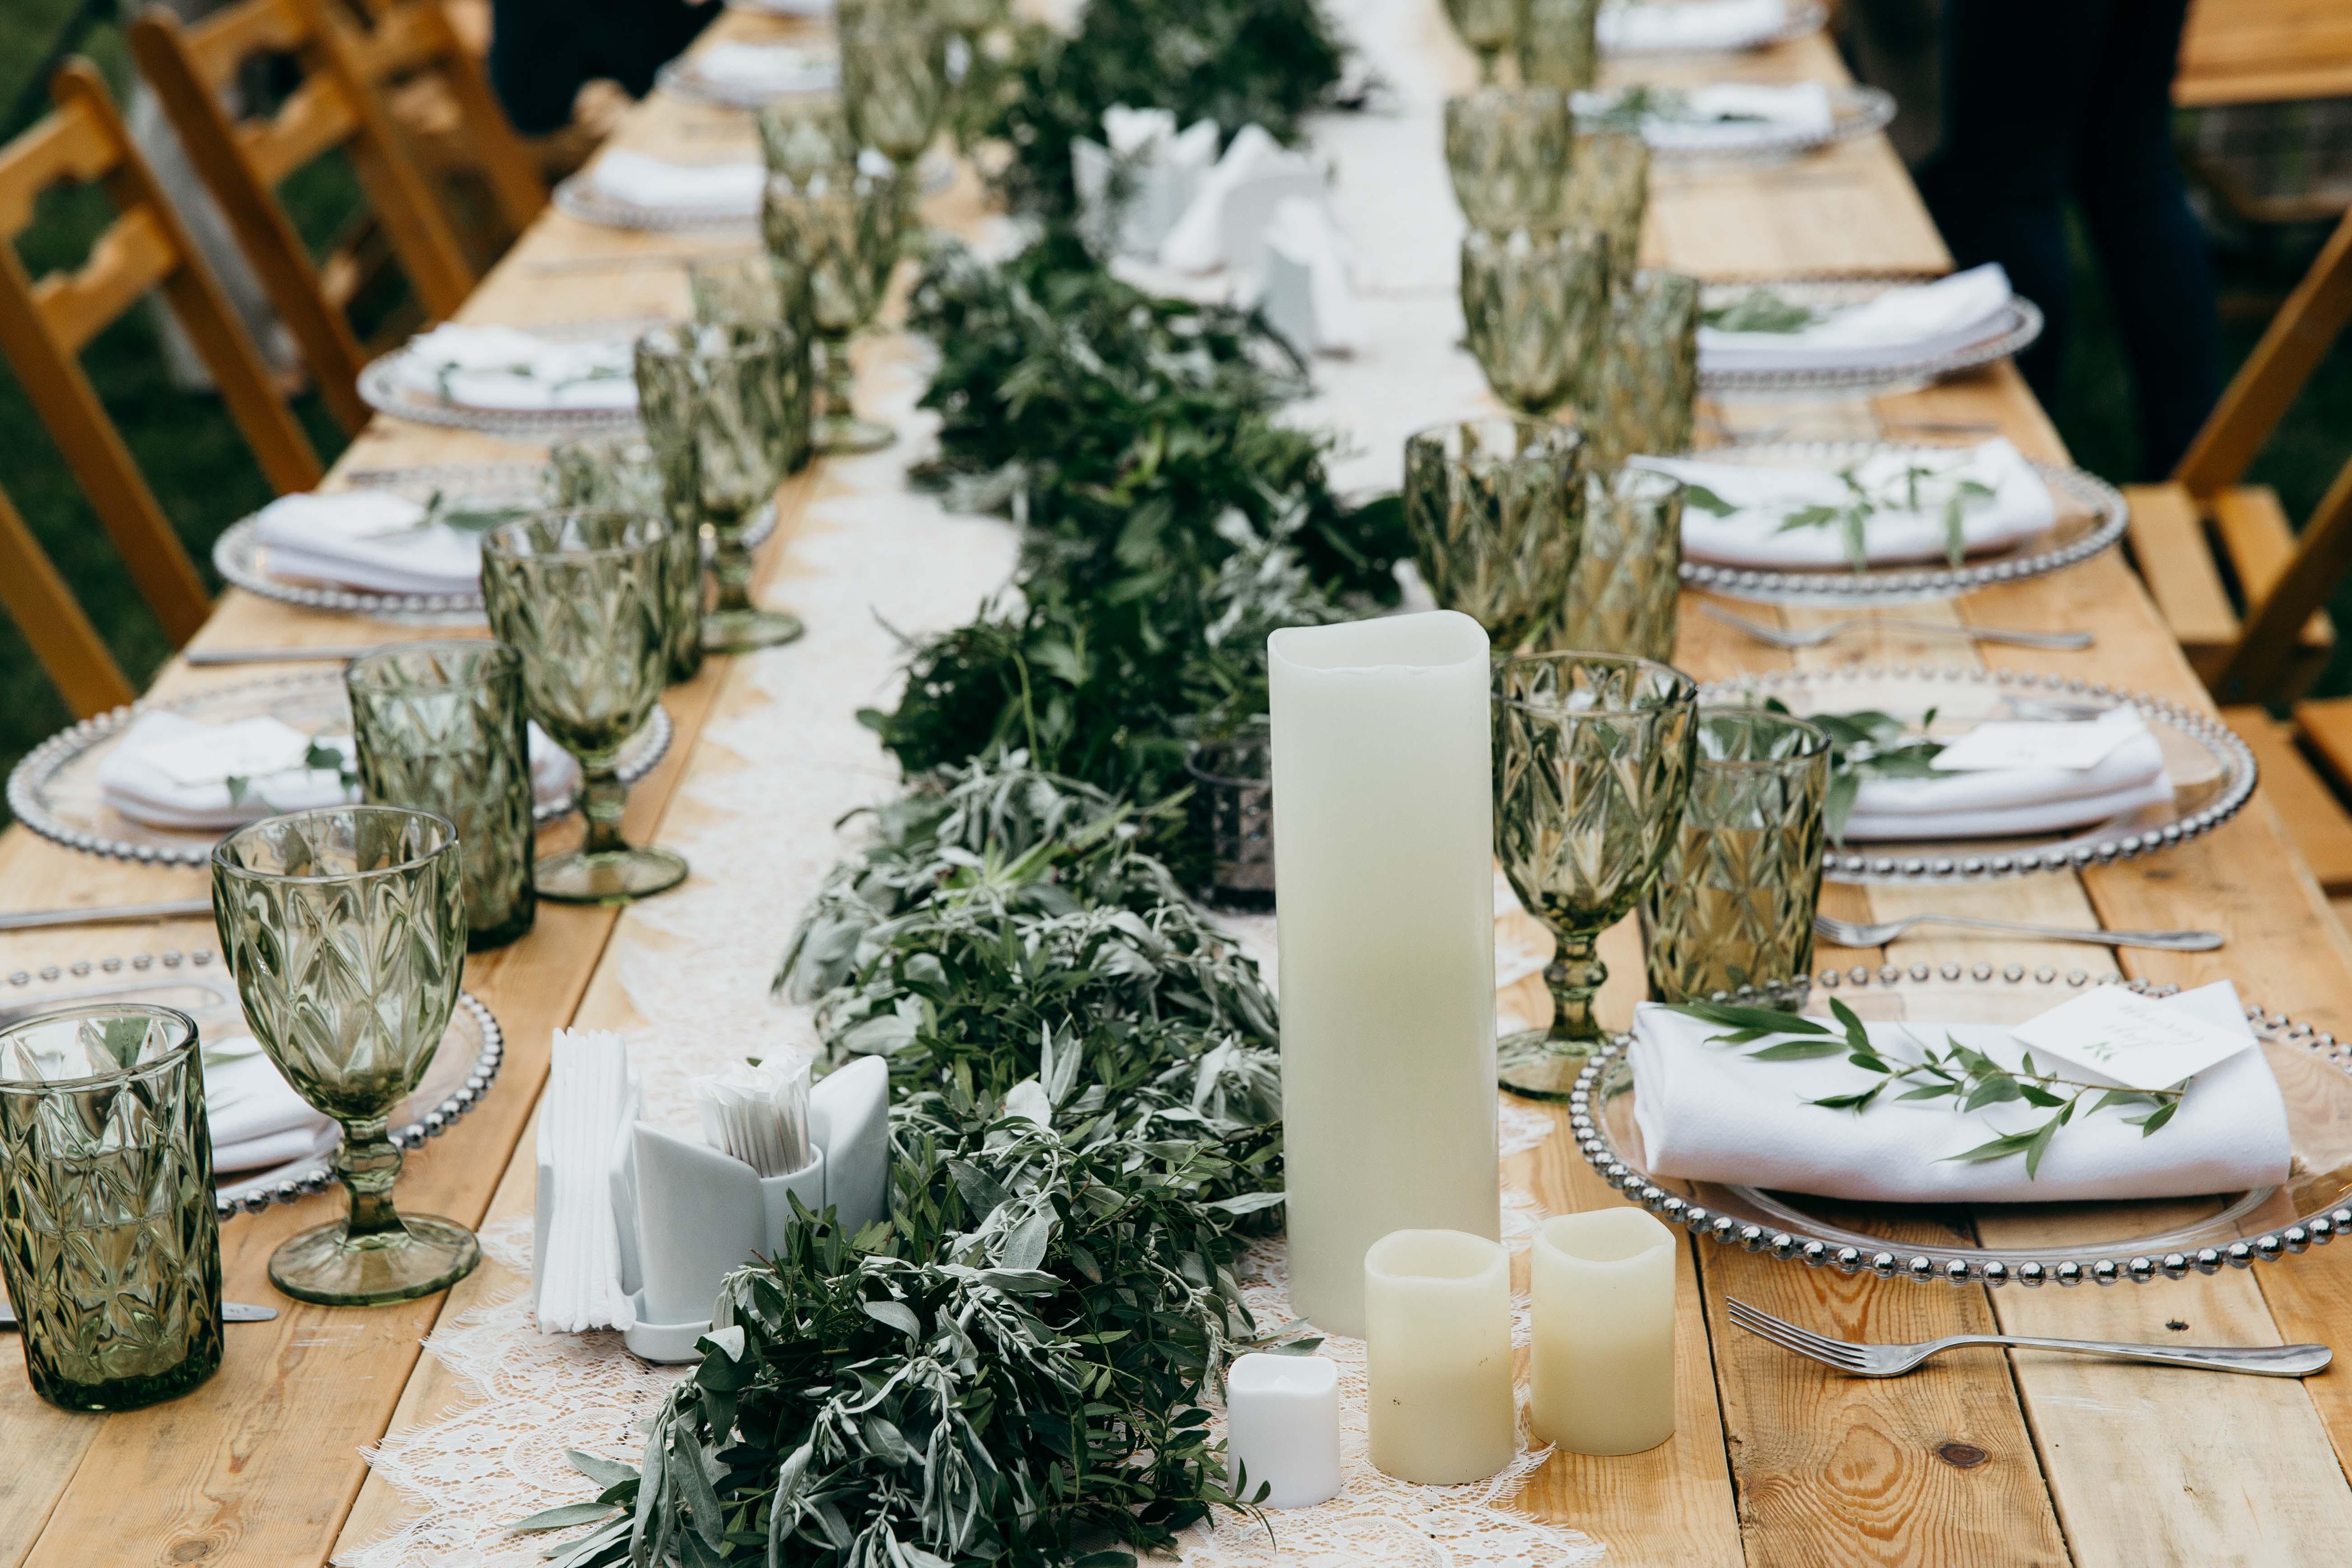 Make Happy Memories Greenery Table Runner